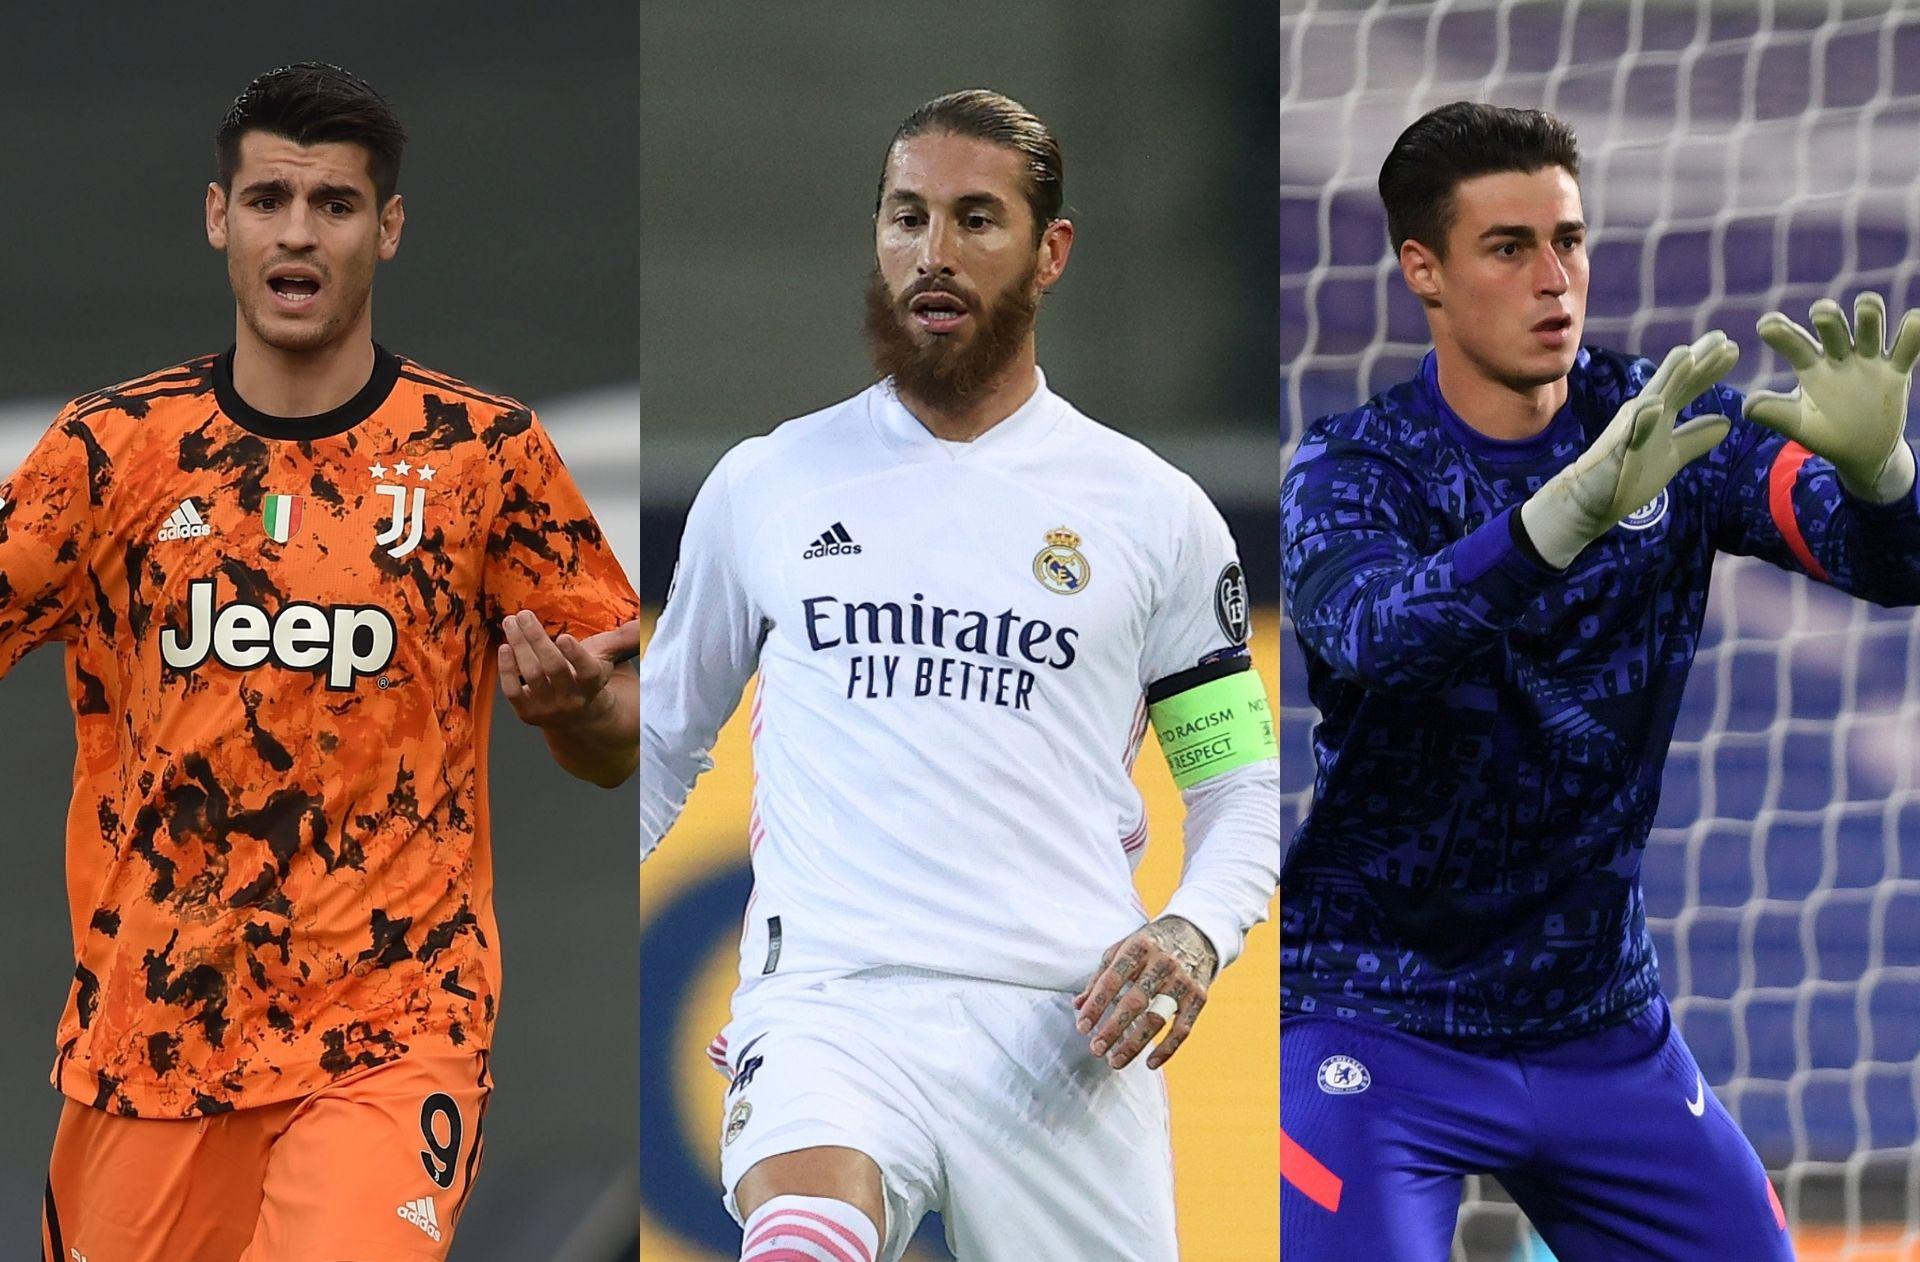 Alvaro Morata of Juventus, Sergio Ramos of Real Madrid, Kepa Arrizabalaga of Cheslea